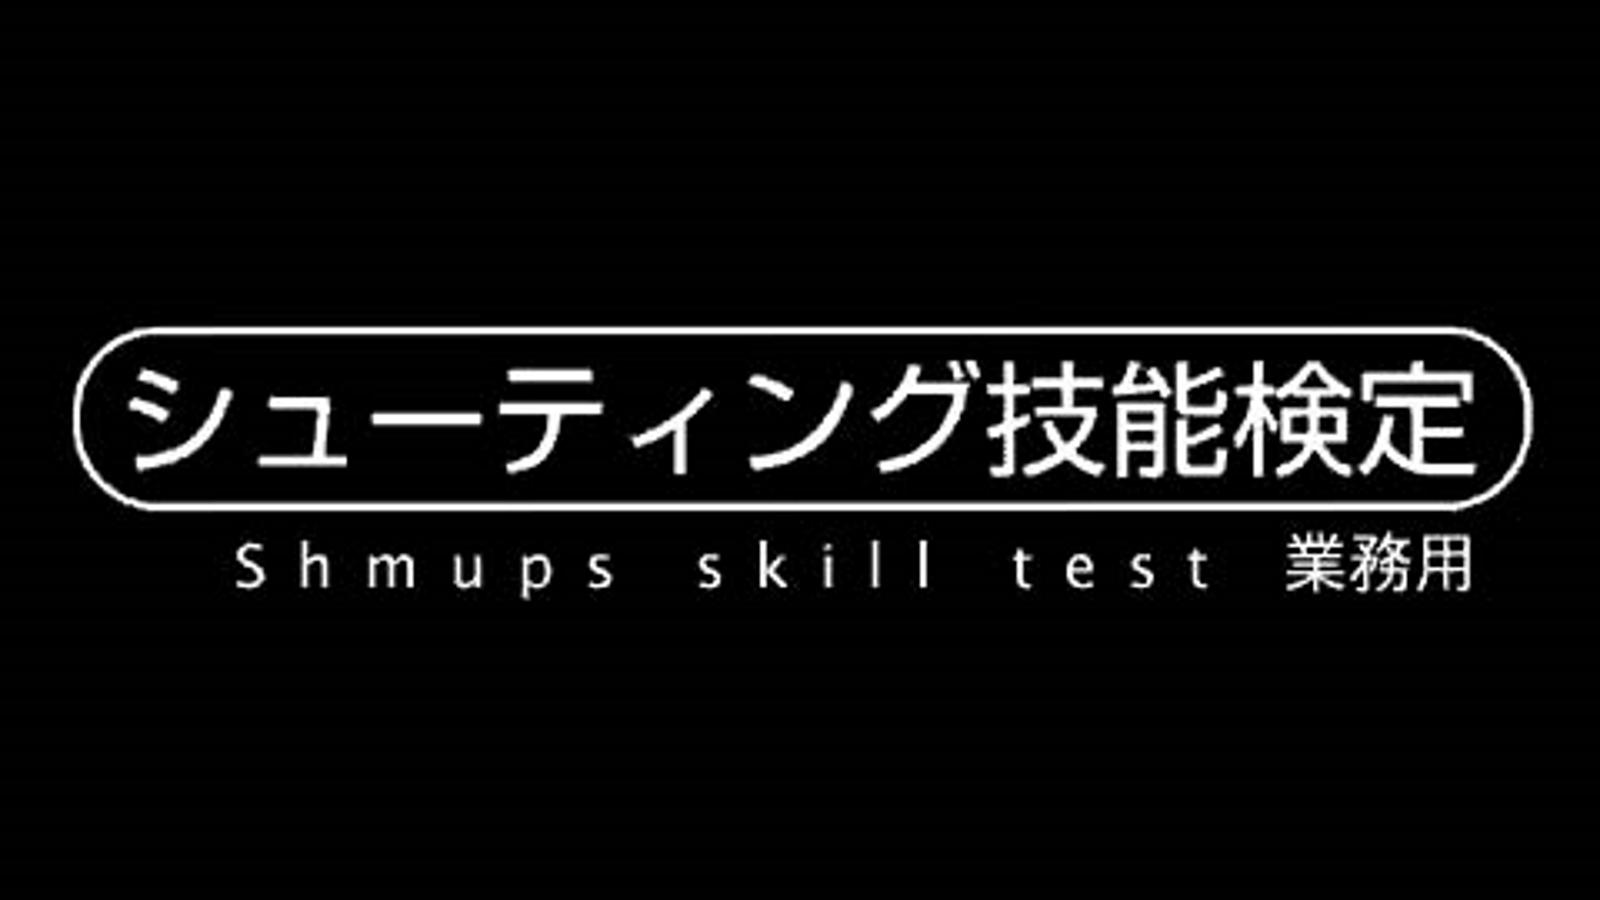 shmupsskill_title